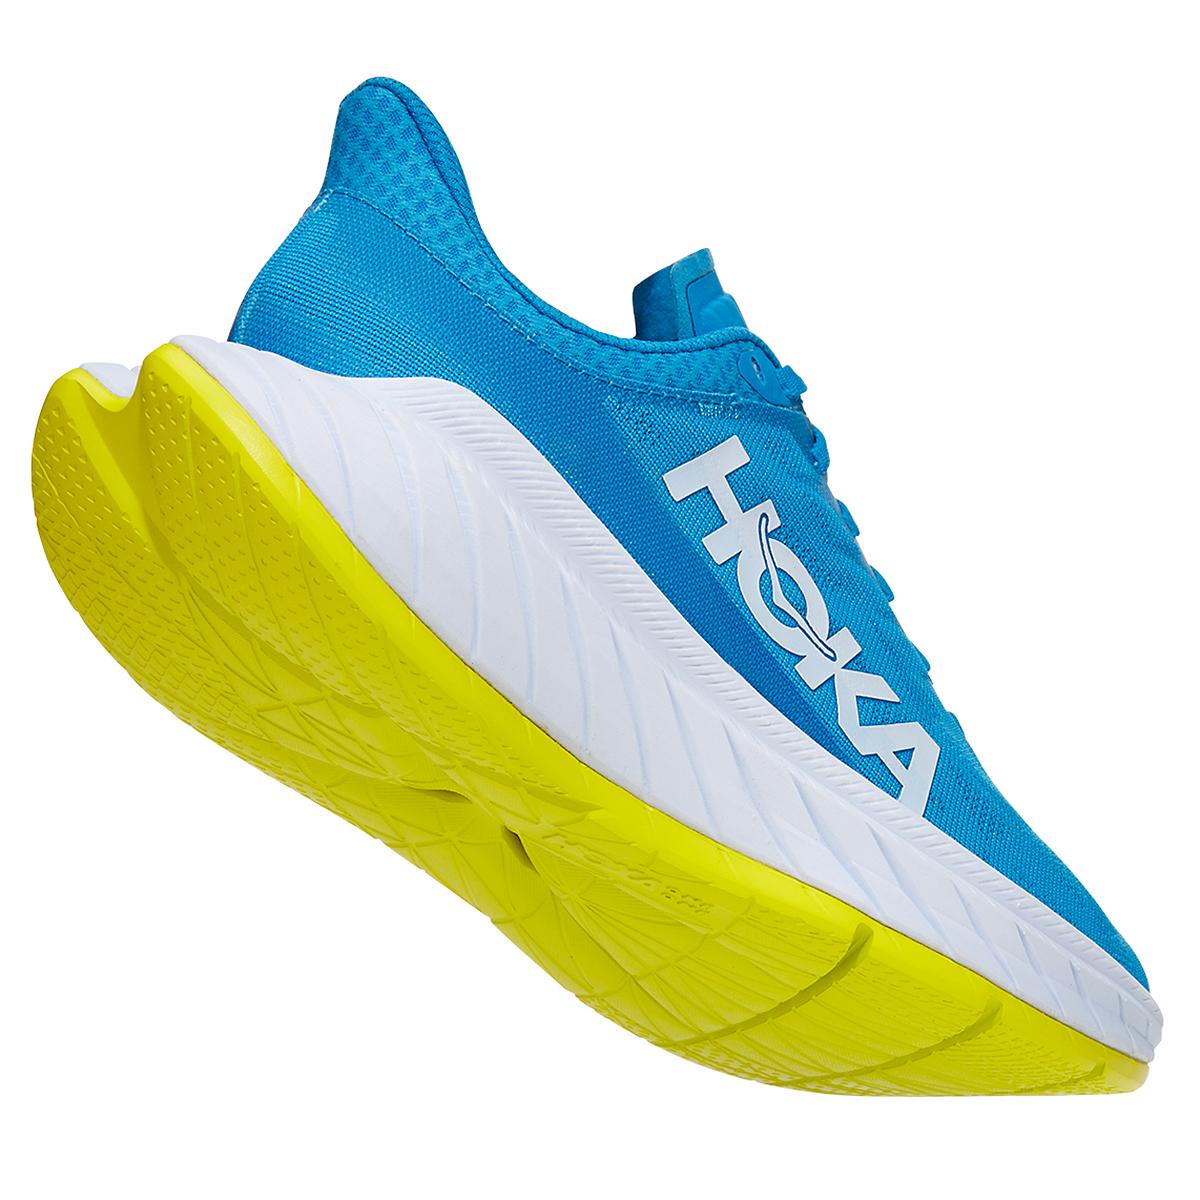 Women's Hoka One One Carbon X 2 Running Shoe - Color: Diva Blue/Citron - Size: 5 - Width: Regular, Diva Blue/Citron, large, image 4